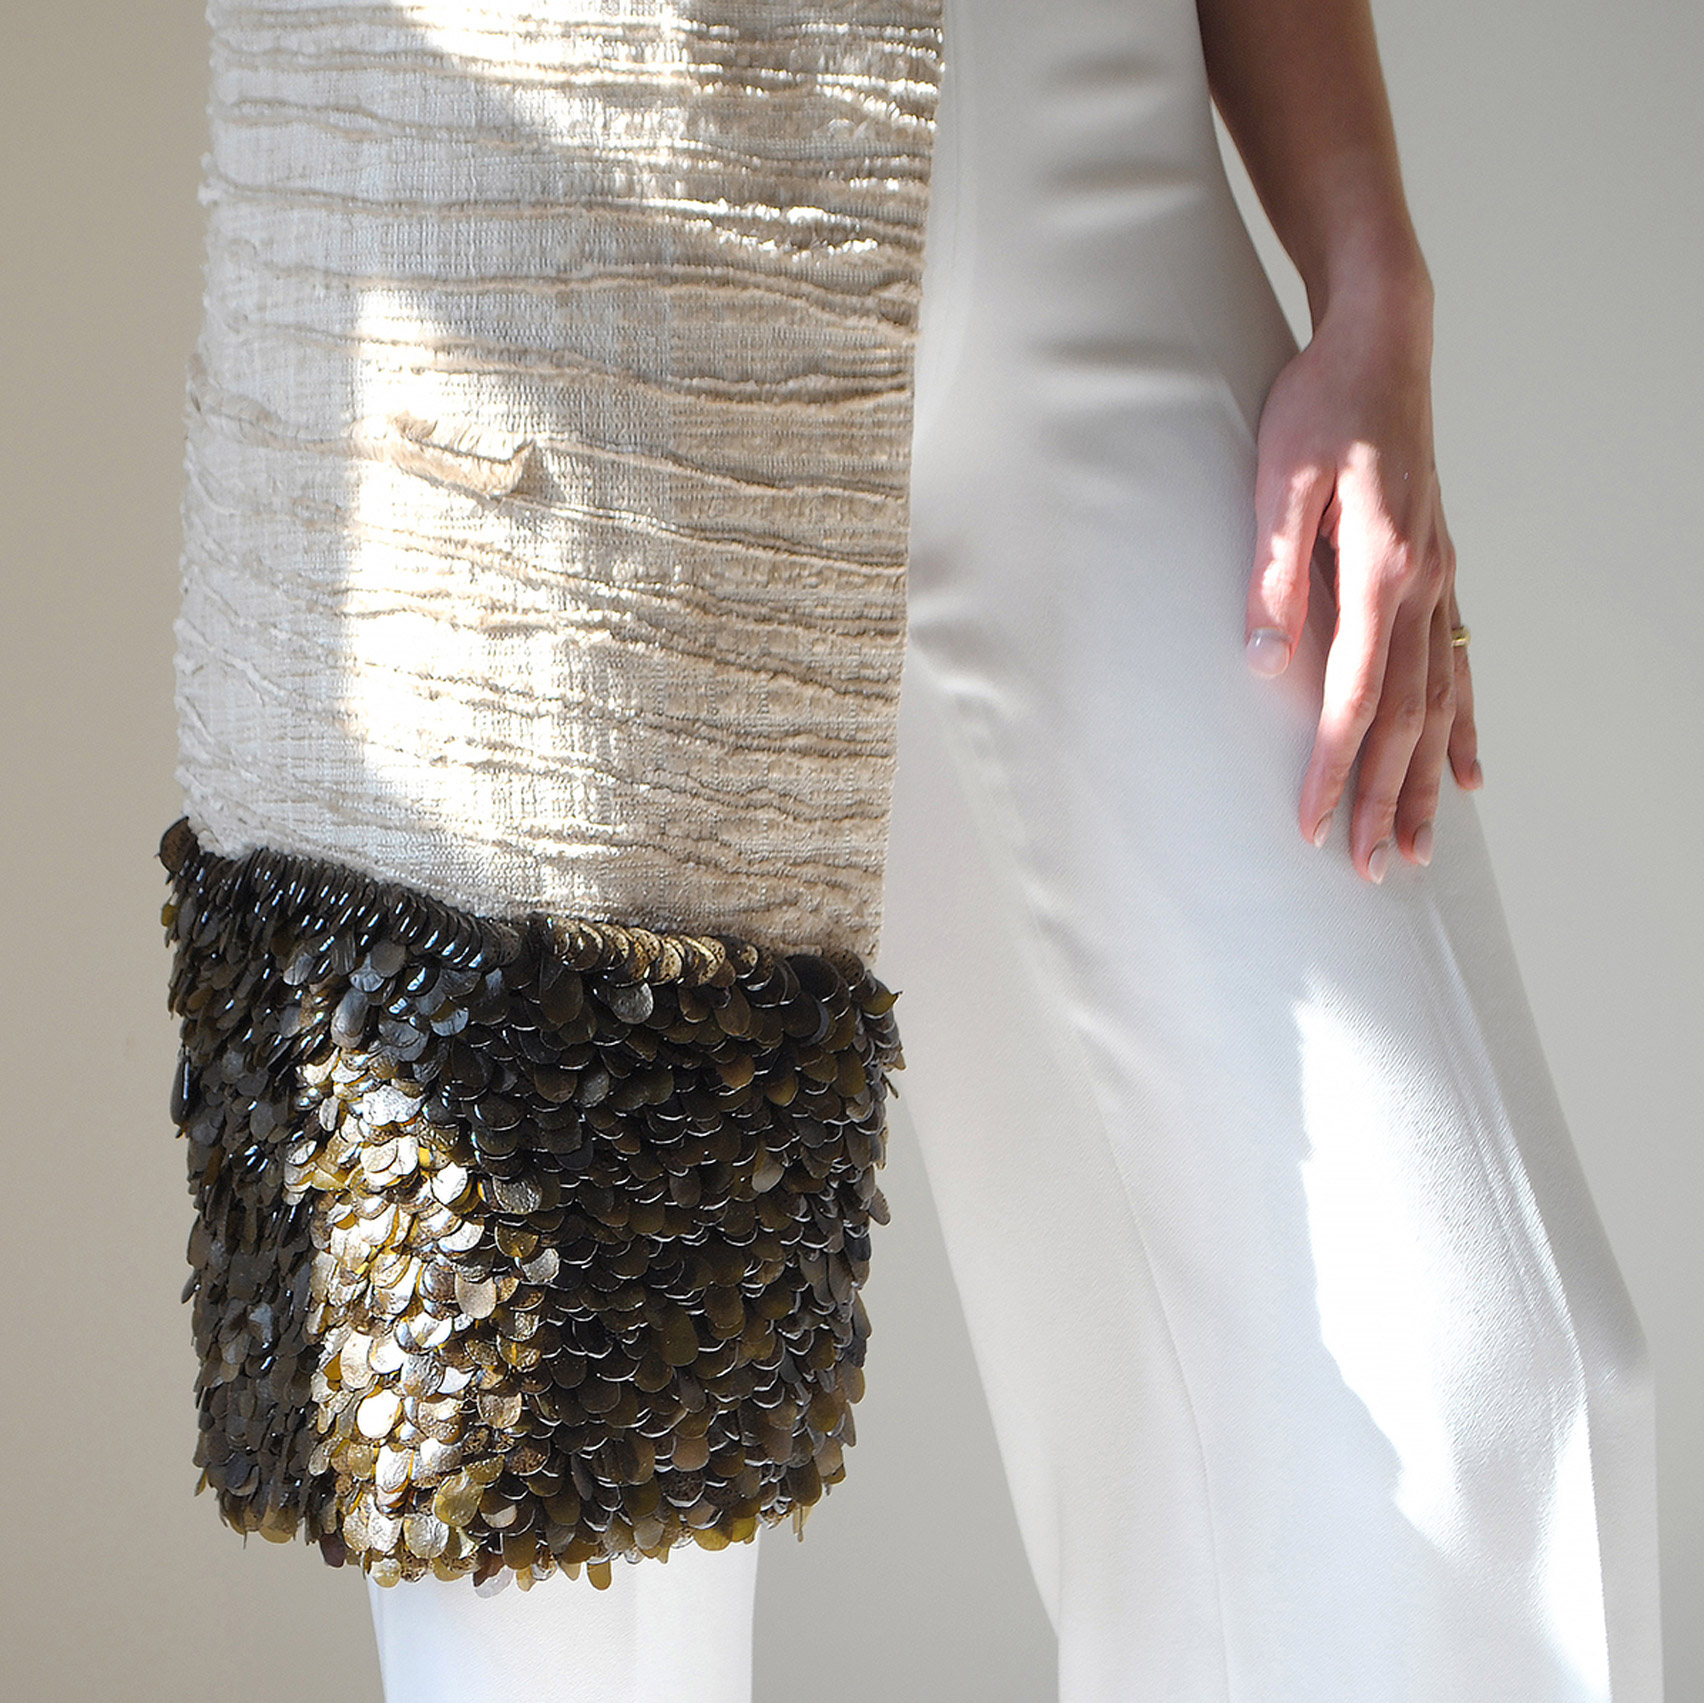 Jasmine Linington uses seaweed to make couture clothing